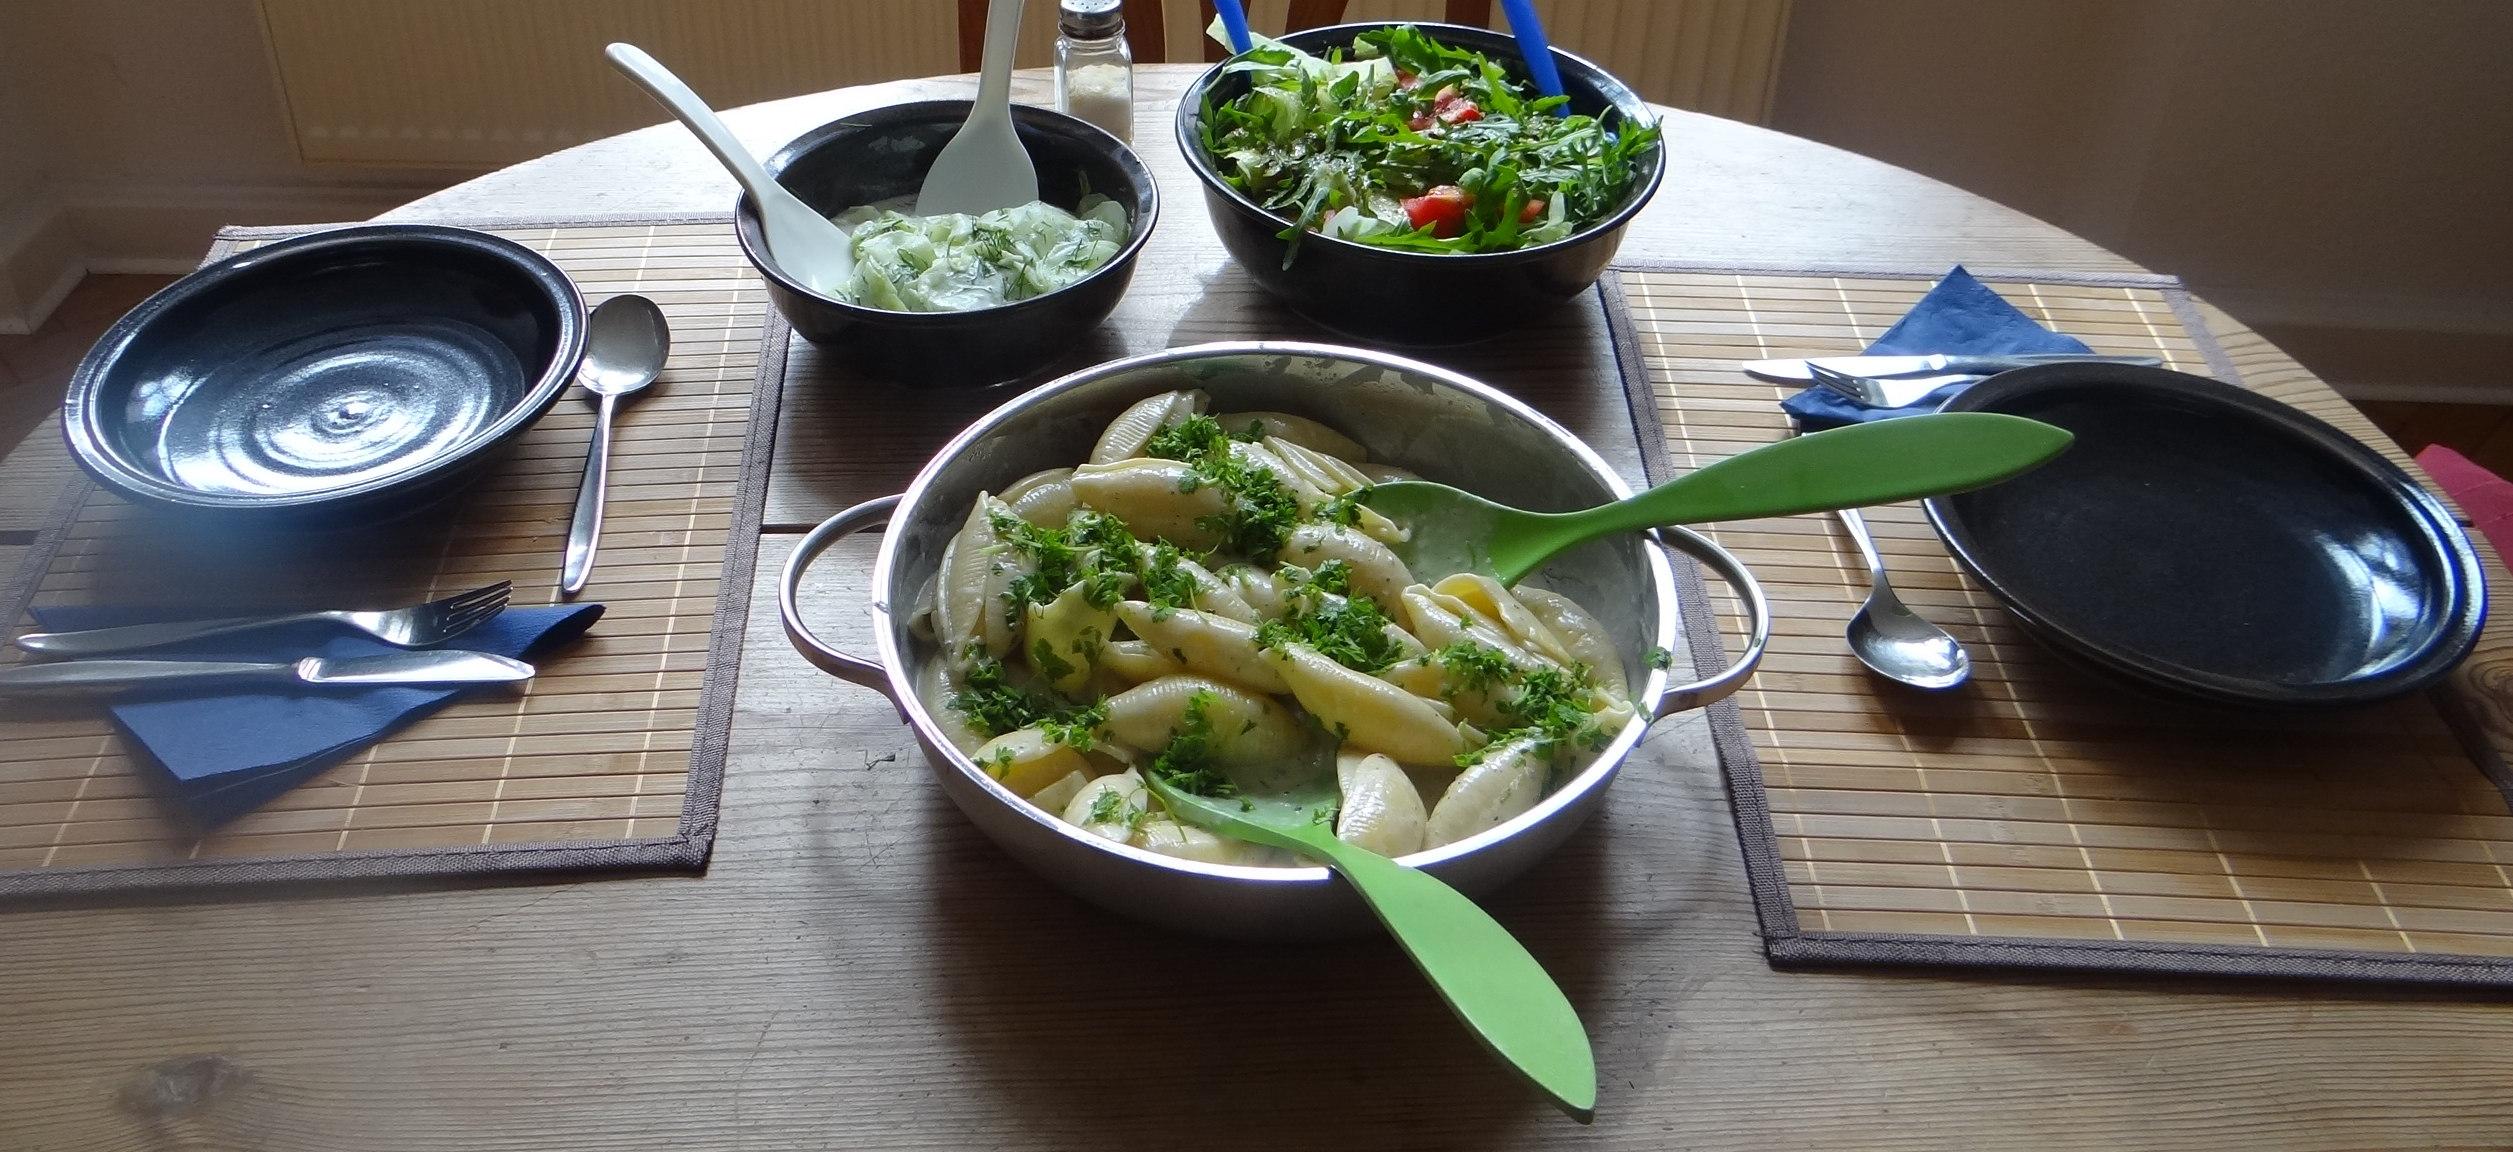 Muschelnudeln,Gorgonzolasauce,Salate (20)